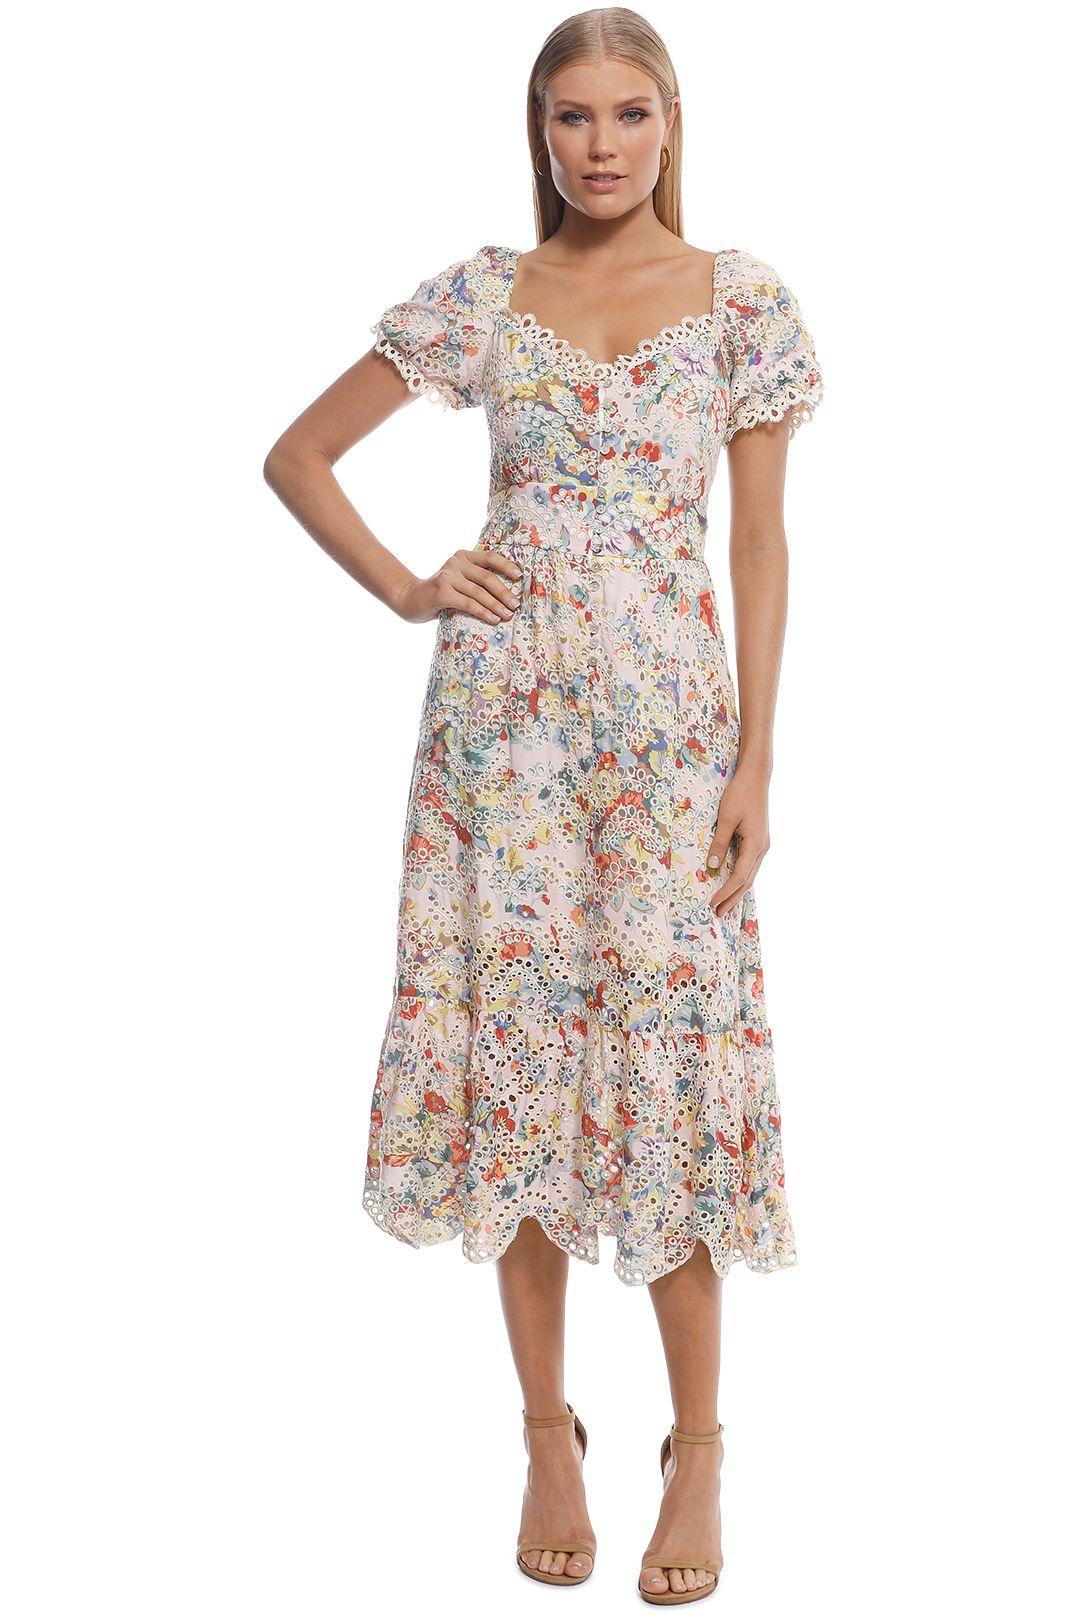 Elliatt - Faith Dress - Pink Floral - Front